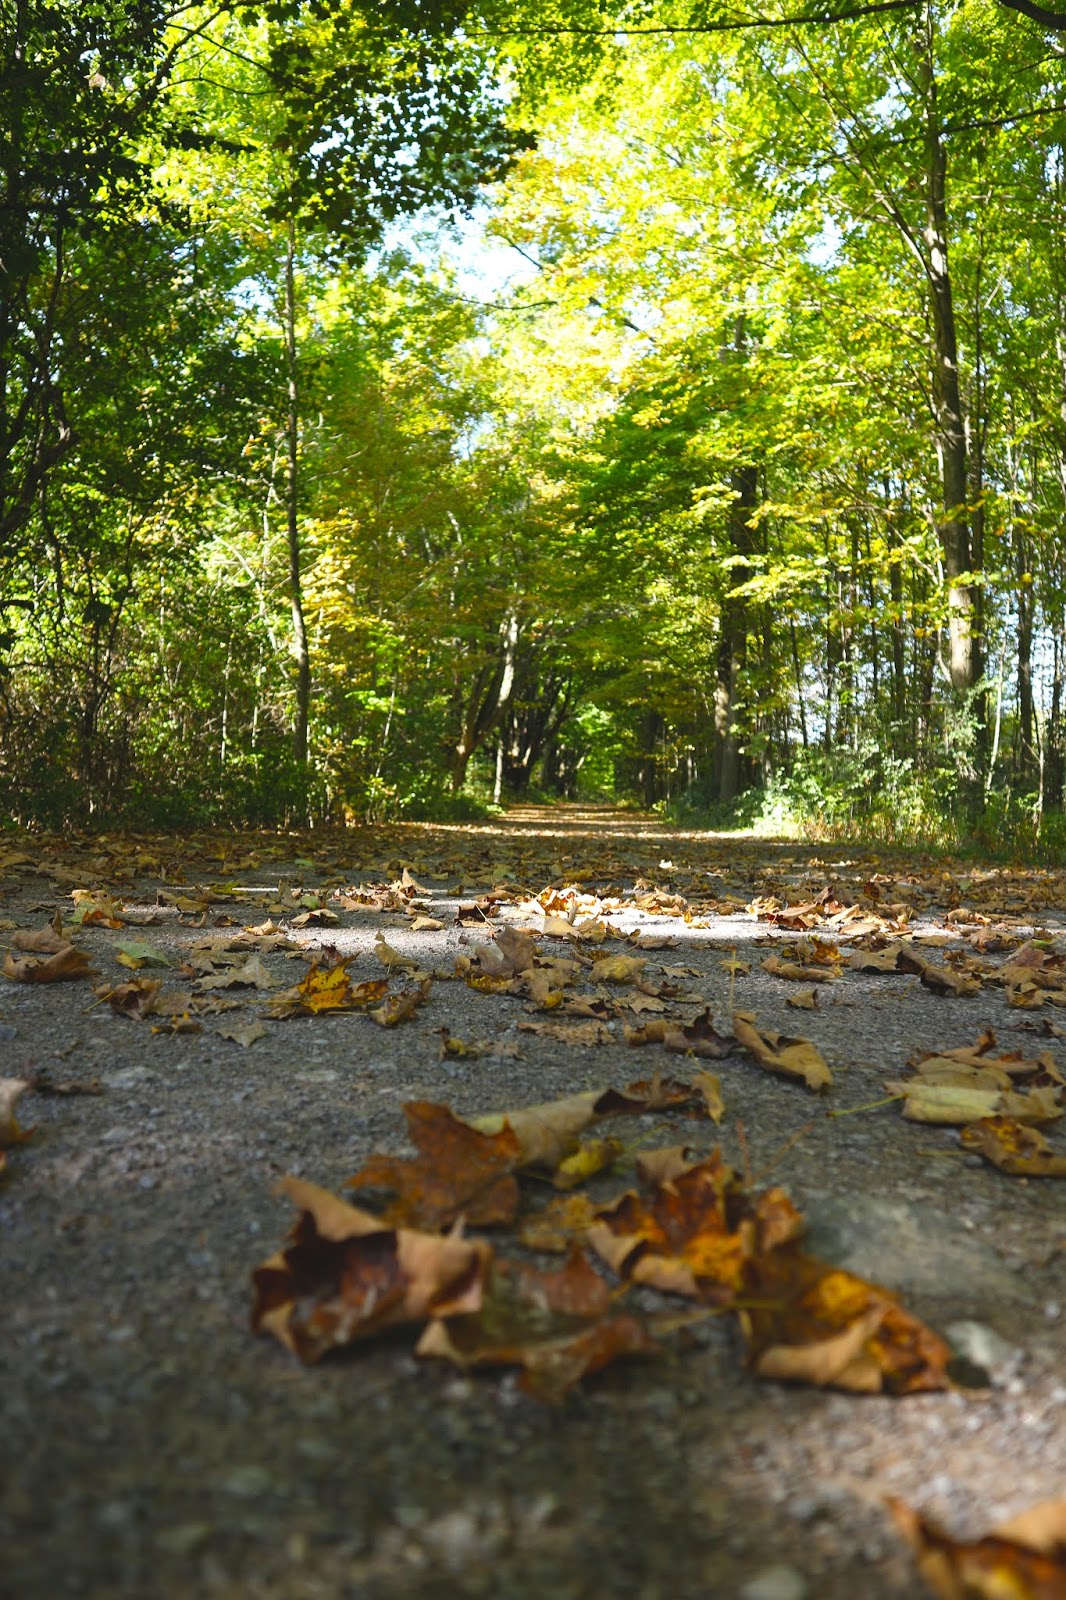 Fall Staycation in Brighton, Ontario - Bay of Quinte - Rosalyn Gambhir